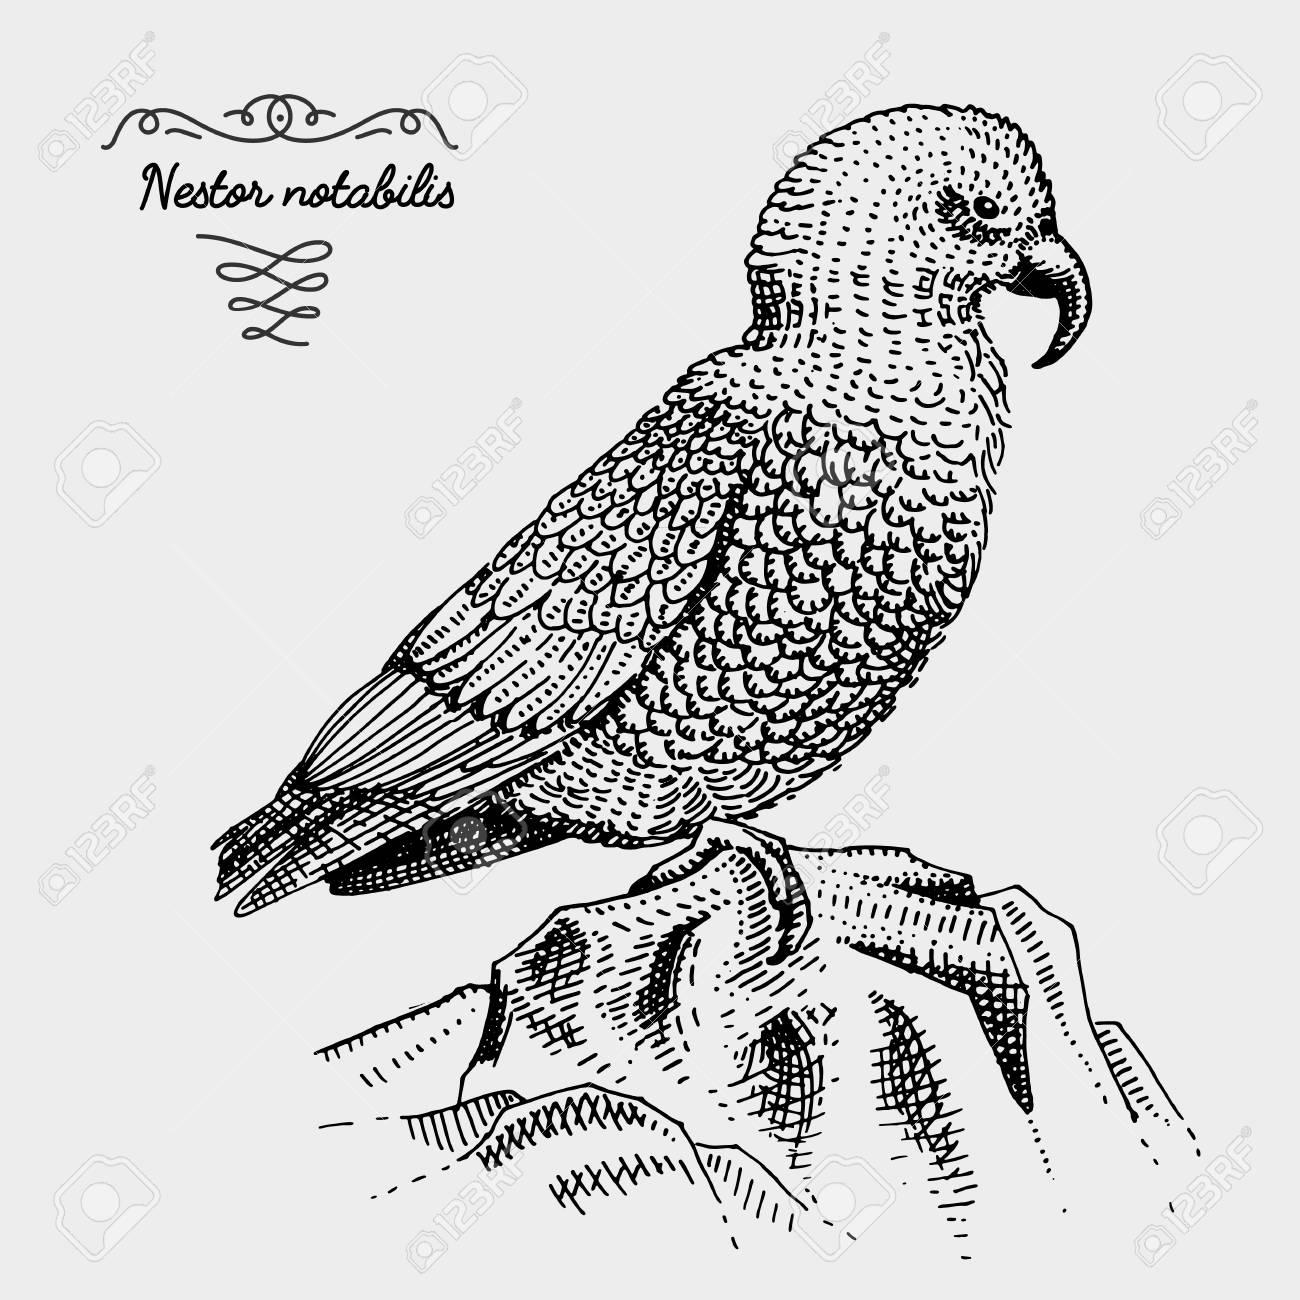 1300x1300 Kea Bird Engraved, Hand Drawn Vector Illustration In Woodcut